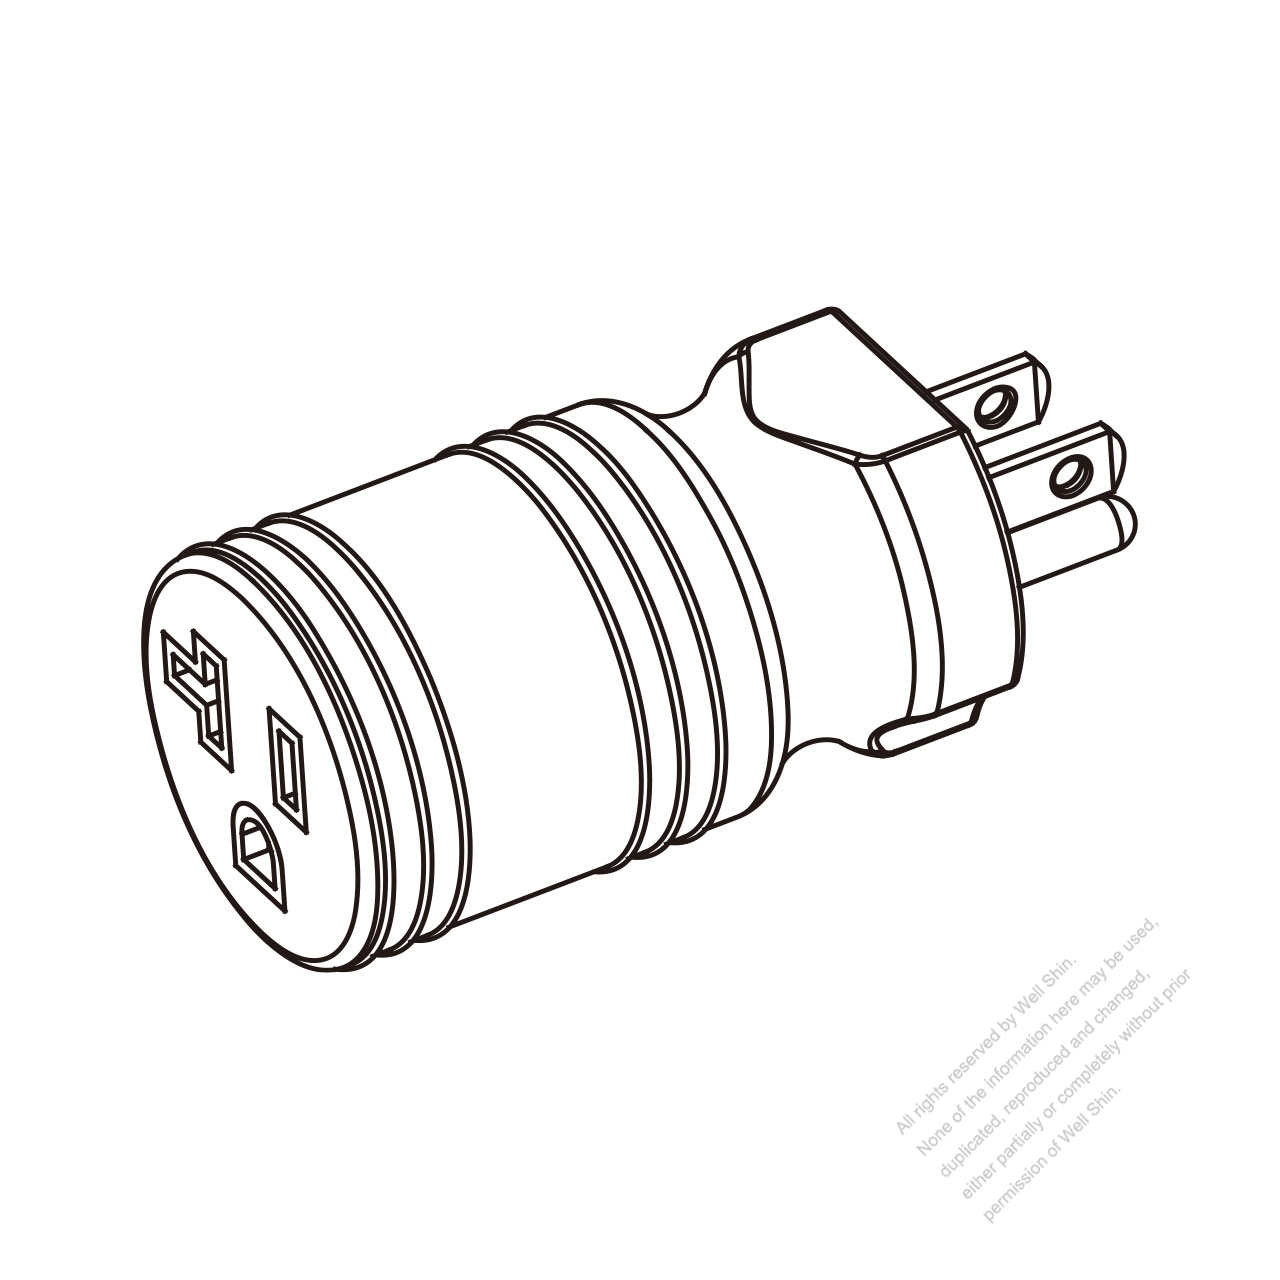 Nema L6 30 Plug Wiring Diagram furthermore Index additionally 3 as well Vitek VT BNC CRIMP FEM Connector p 91976 in addition Twist Lock Plug Wiring Diagram. on nema 5 20p